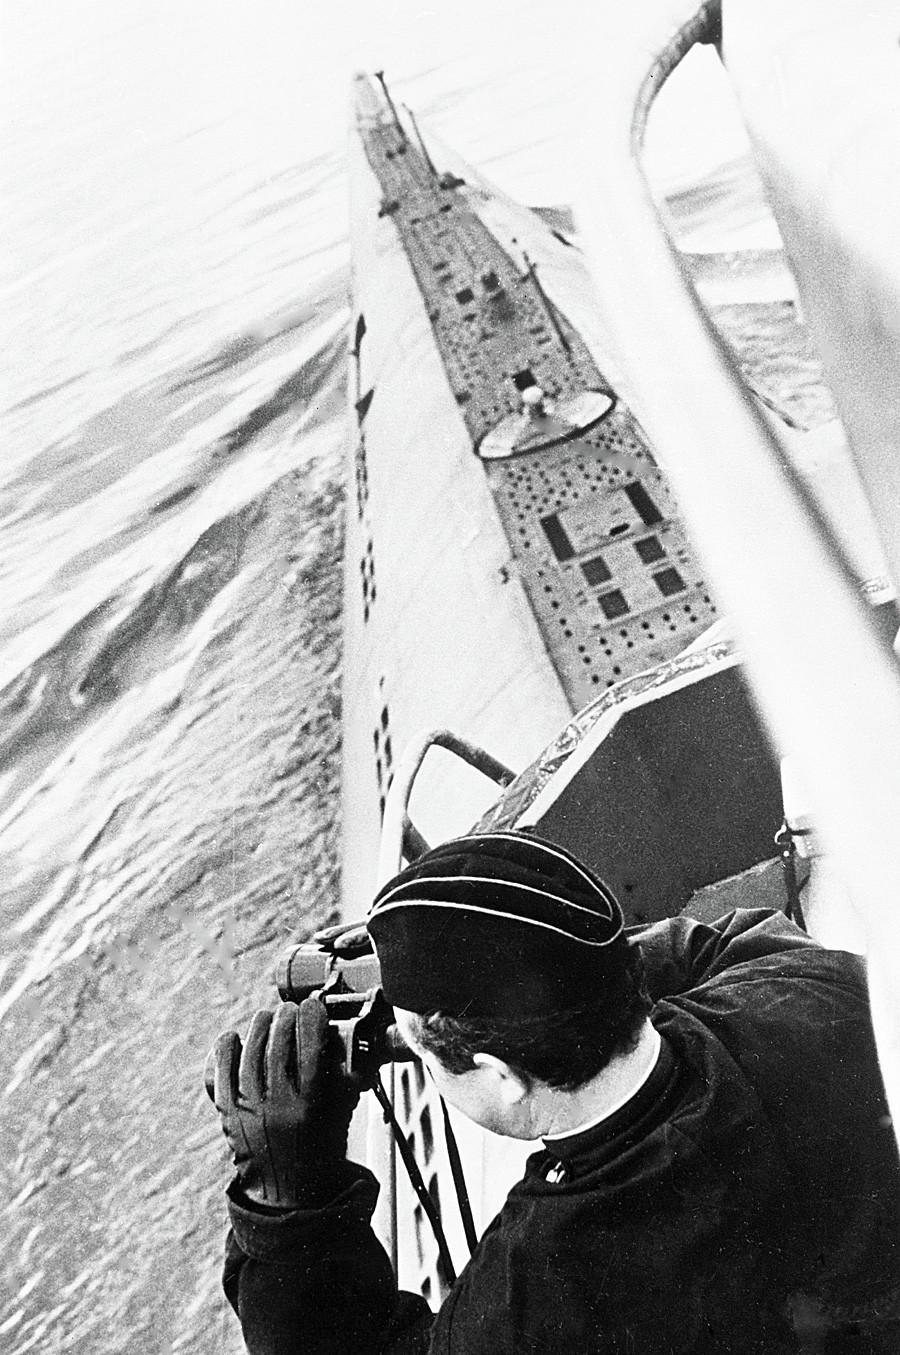 Kapitan sovjetske podmornice, 1968